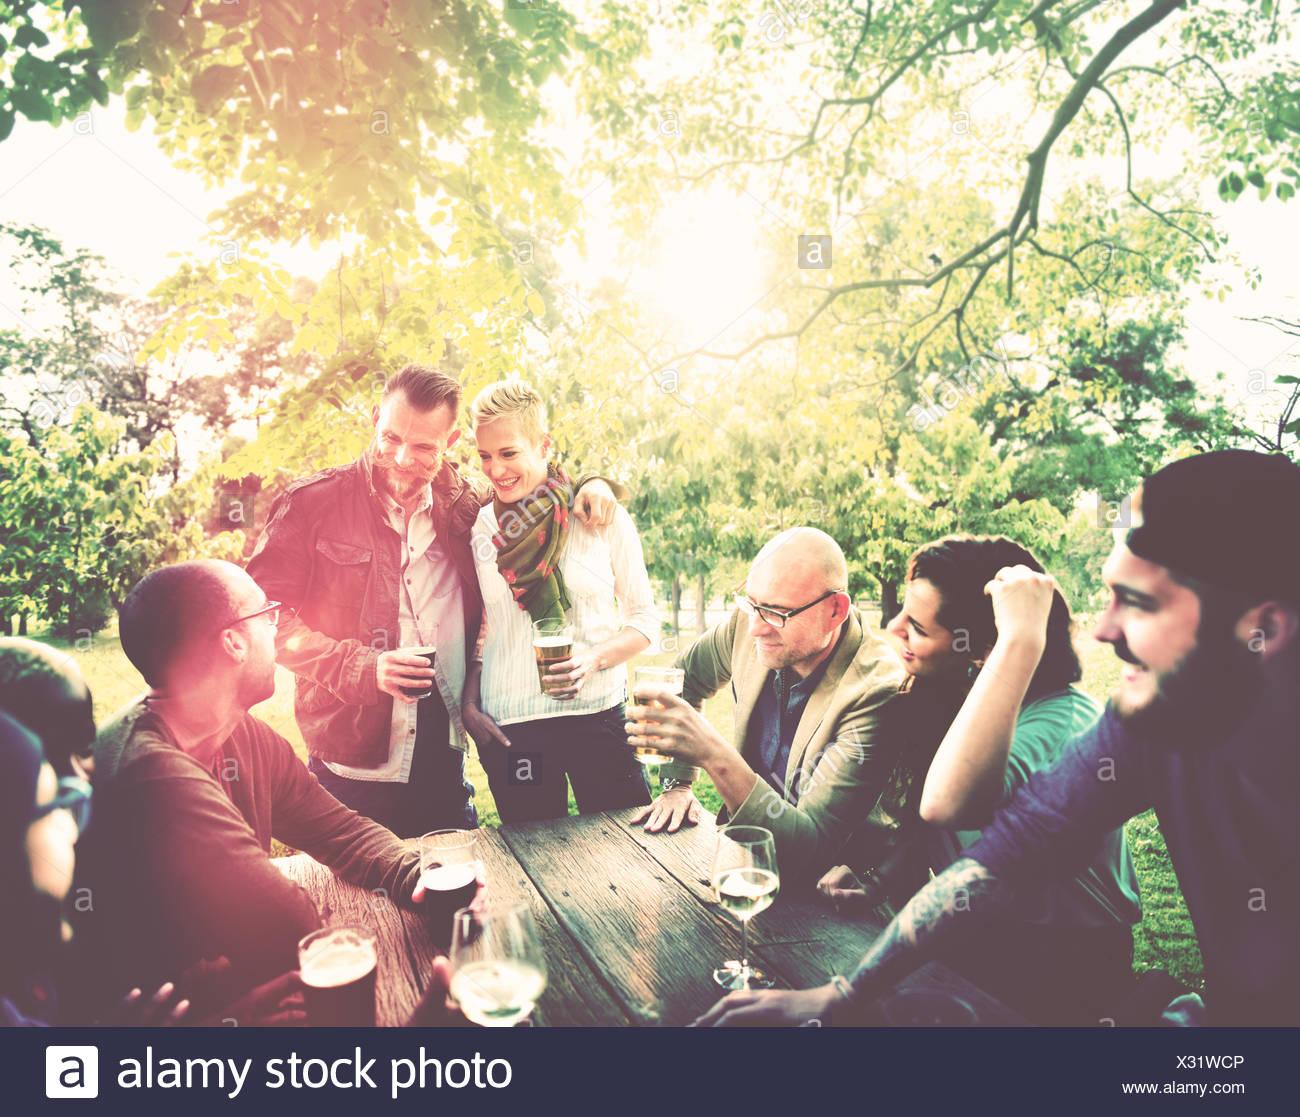 Amigo celebrar fiesta alegre estilo picnic concepto potable Imagen De Stock